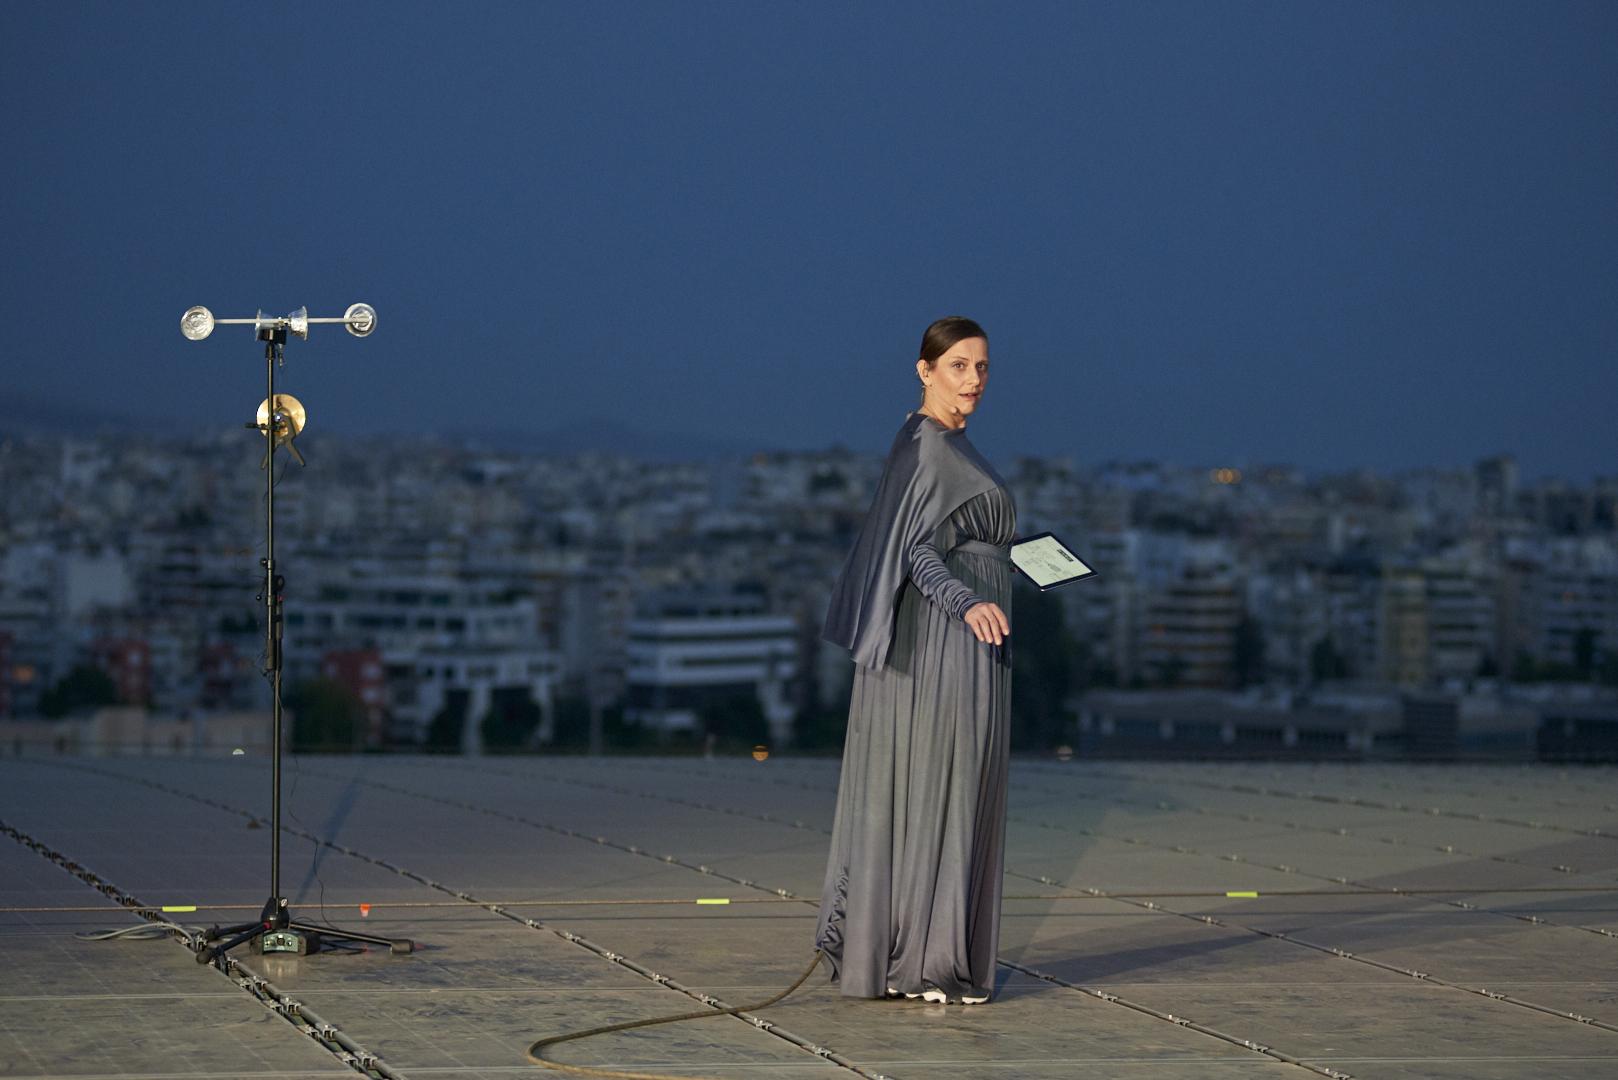 #snfccAtHome music,Μετέωρη, Άννα Παγκάλου, photo: Yiorgis Yerolymbos